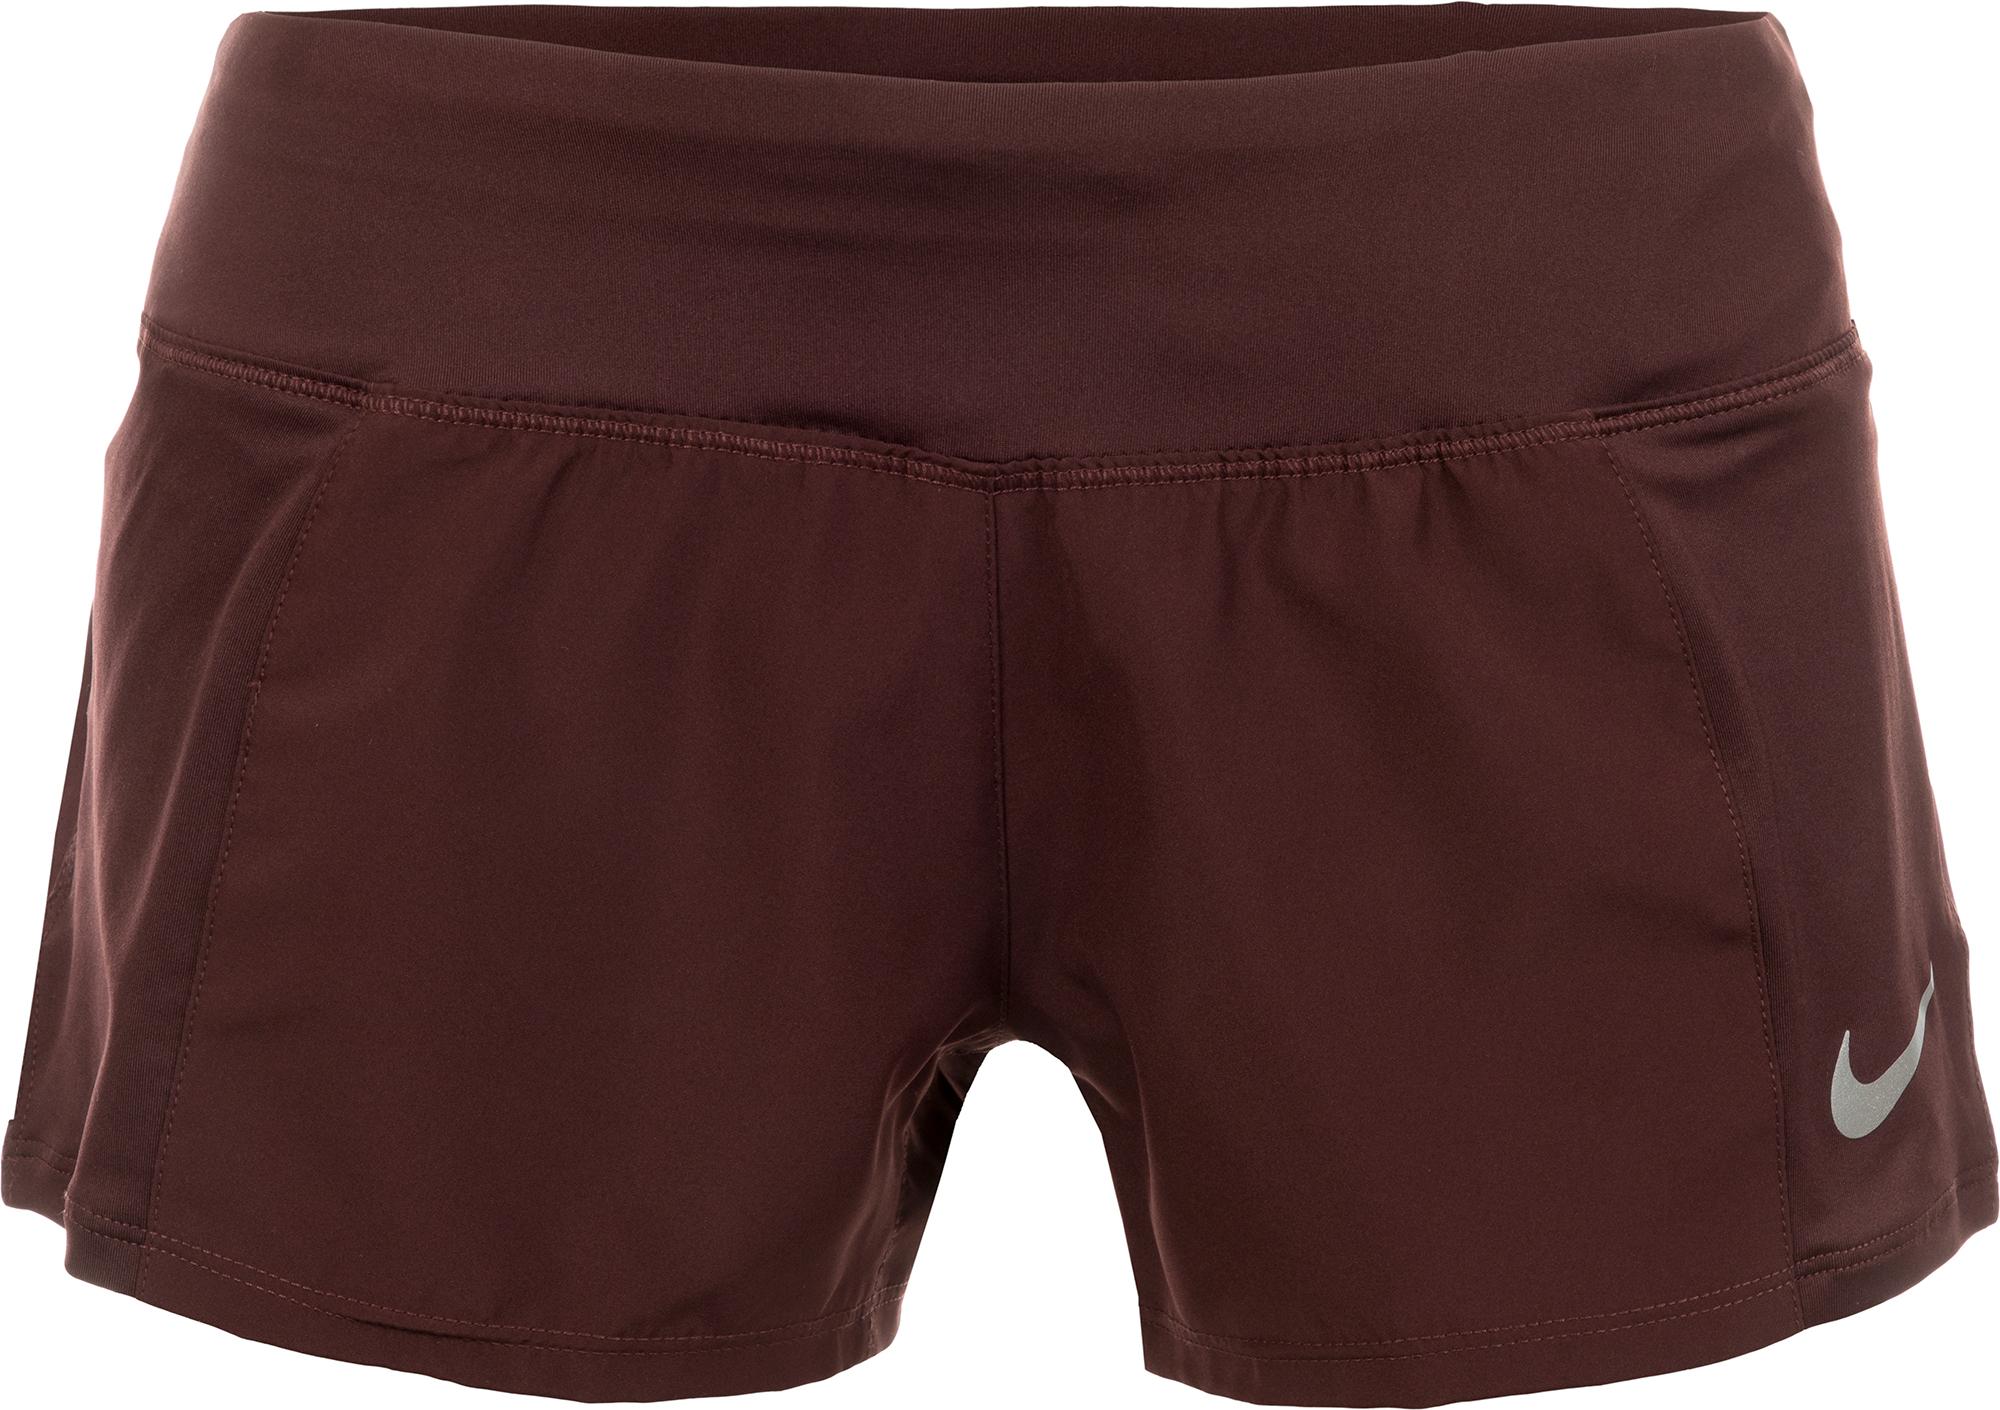 Nike Шорты женские  Dry, размер 46-48